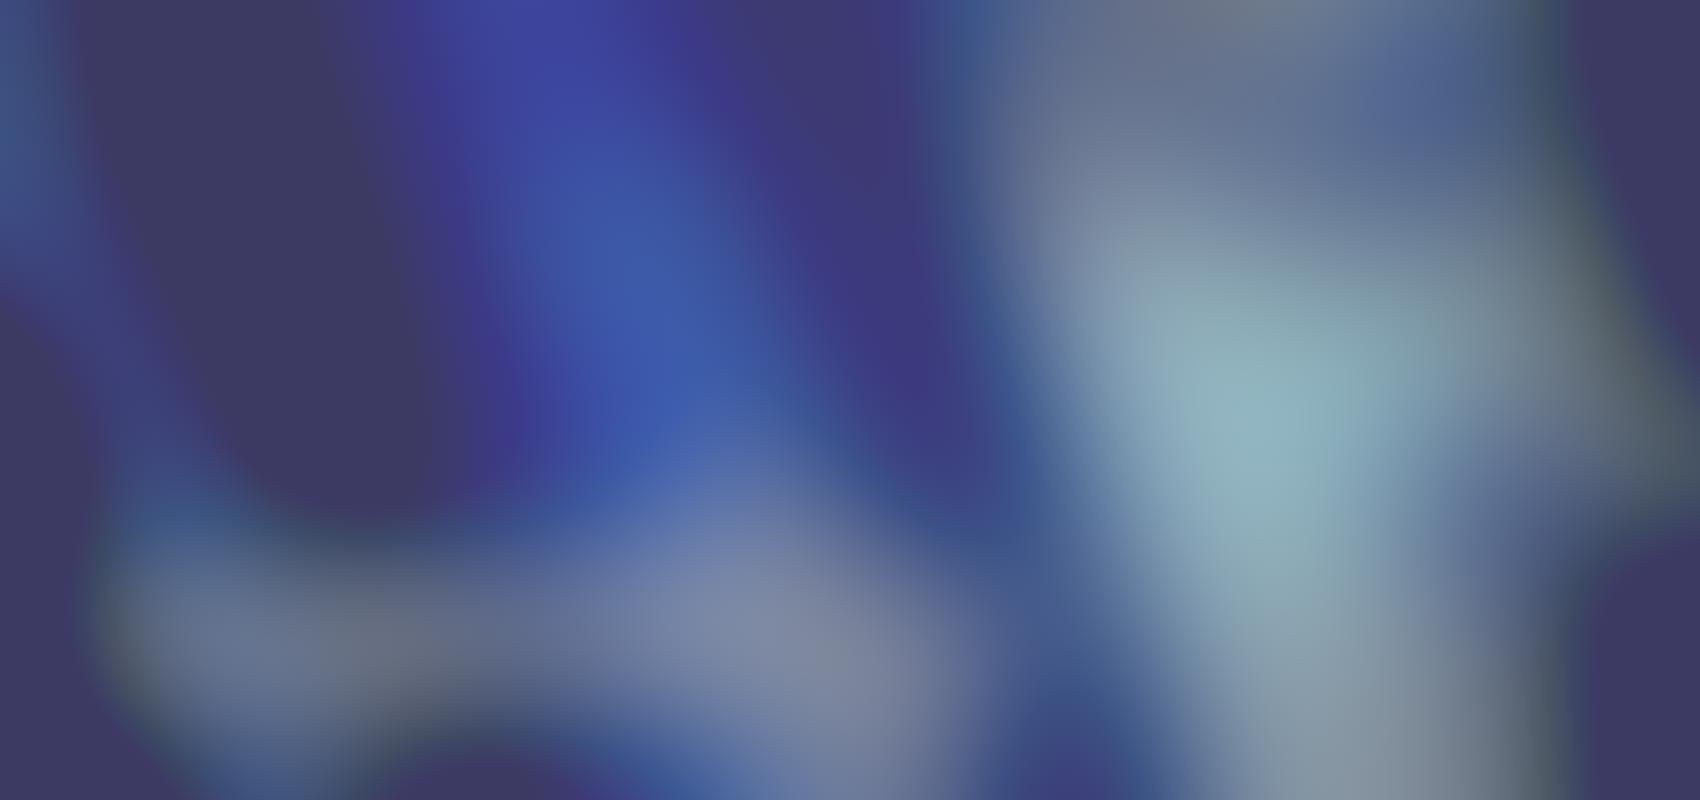 Banner image for hub: Dementia